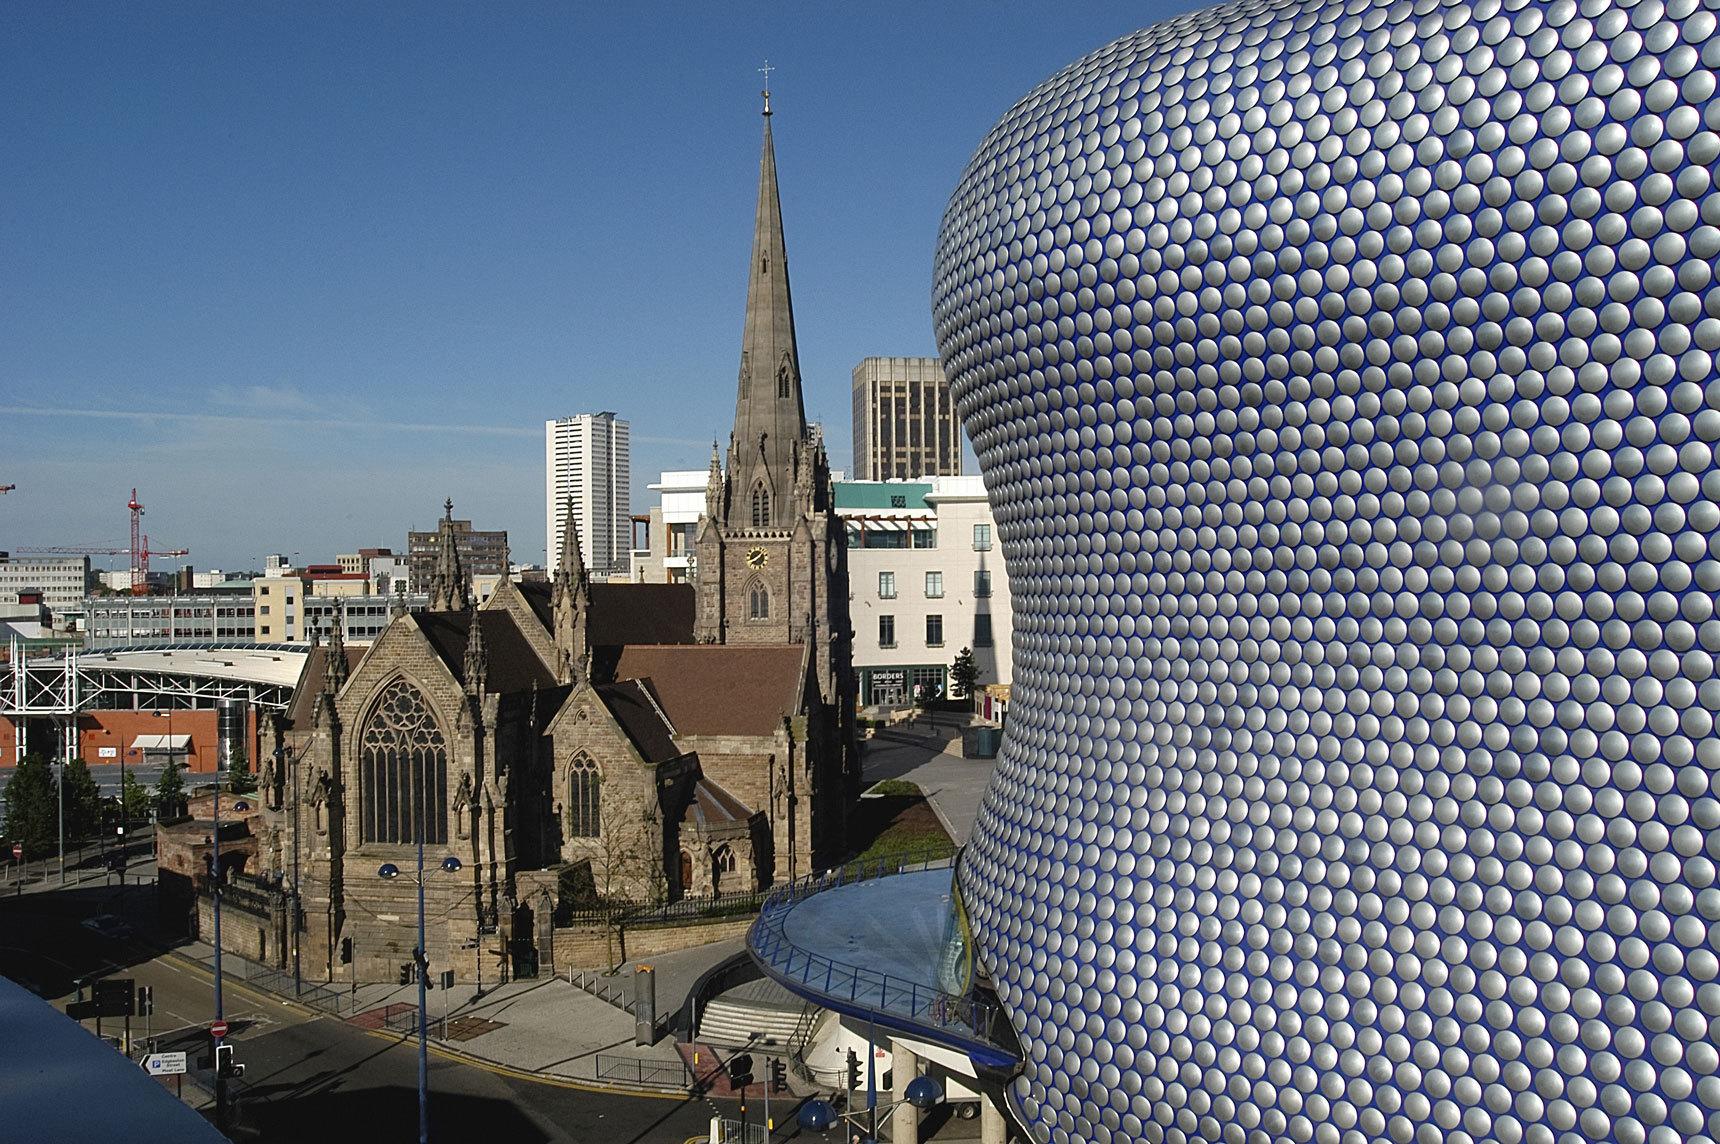 All hail the Midlands powerhouse | Plowman Craven